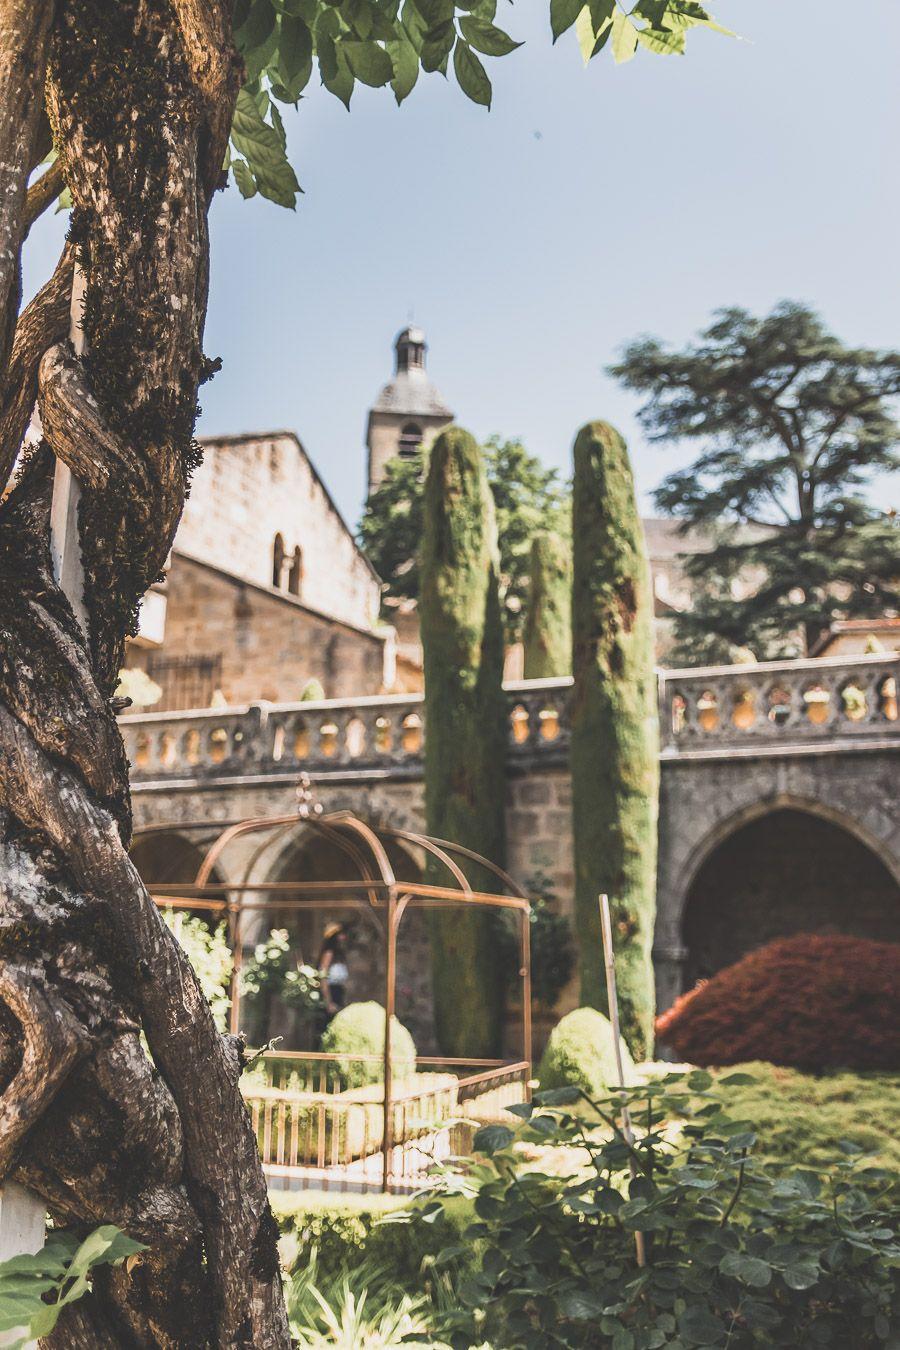 Architecture et jardin lotois